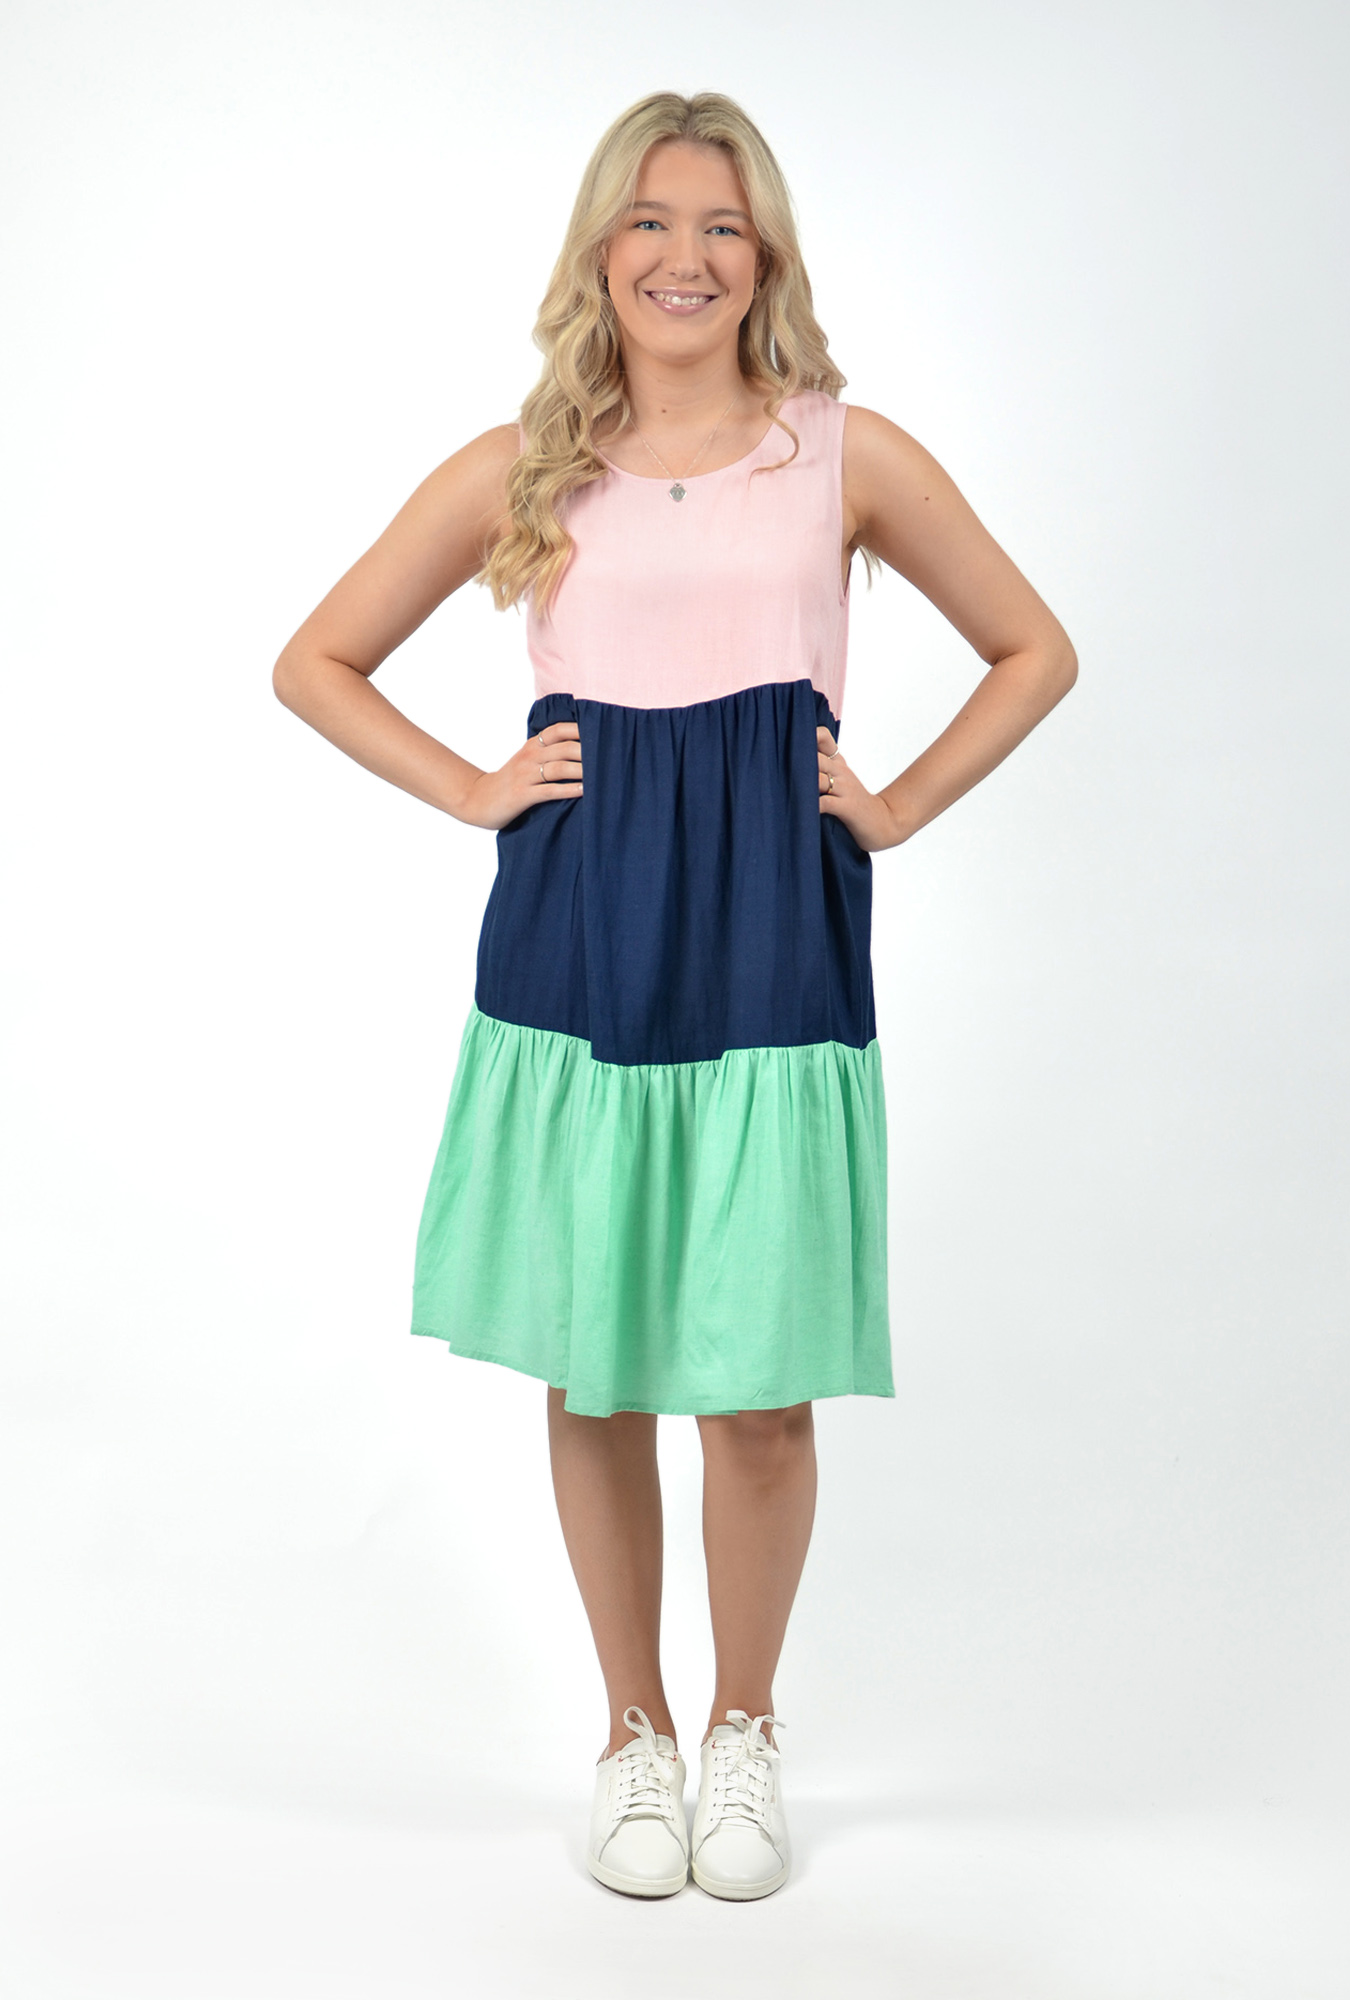 Neapolitan dress in Mix 6